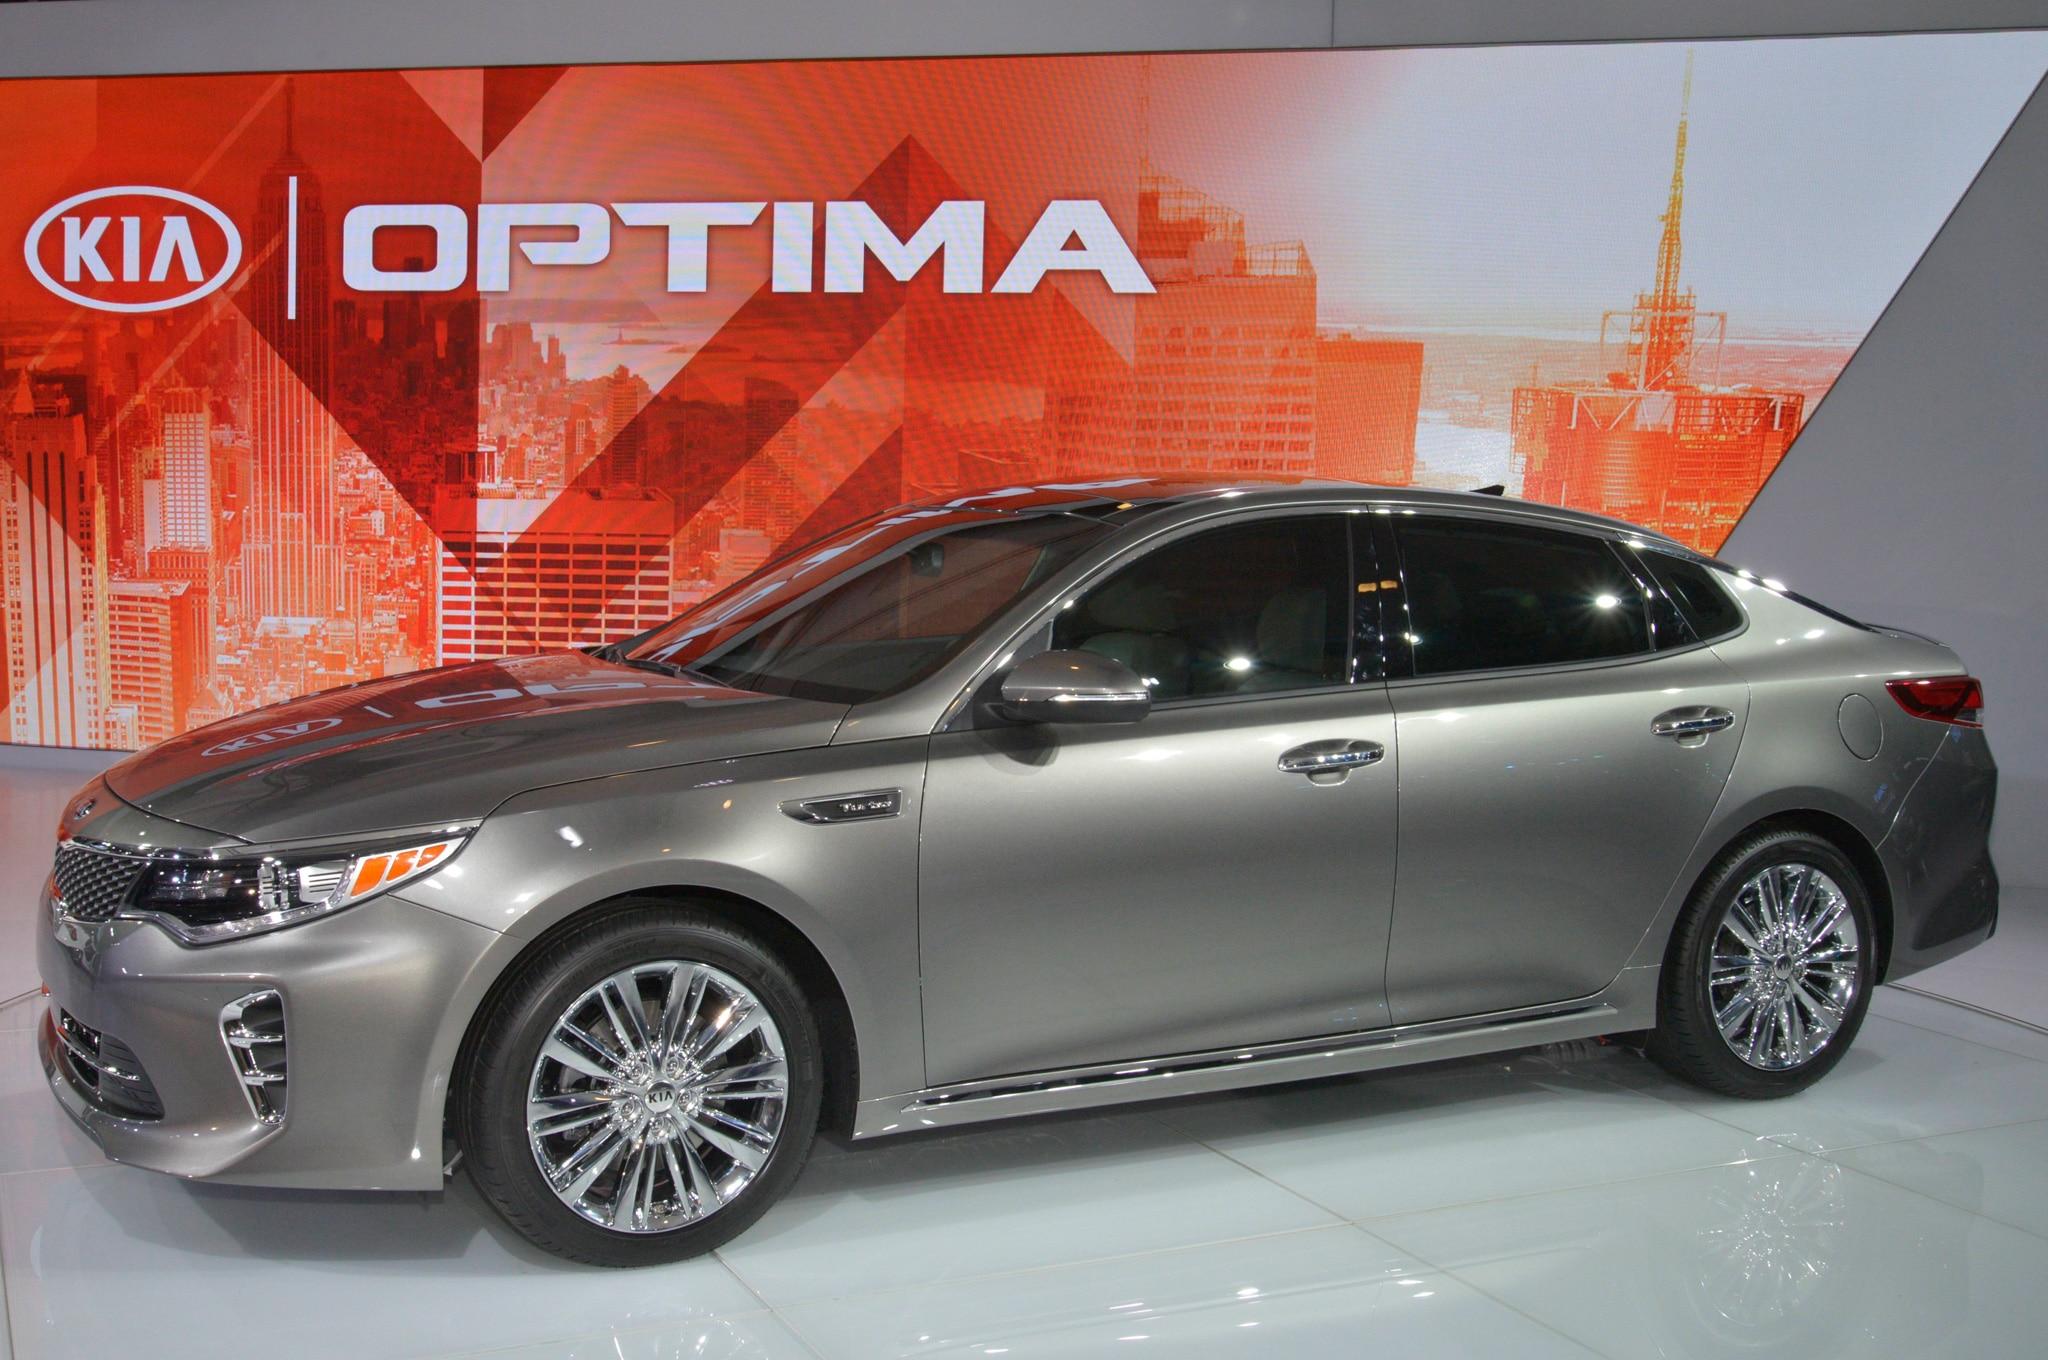 2016 Kia Optima Bows At New York Auto Show